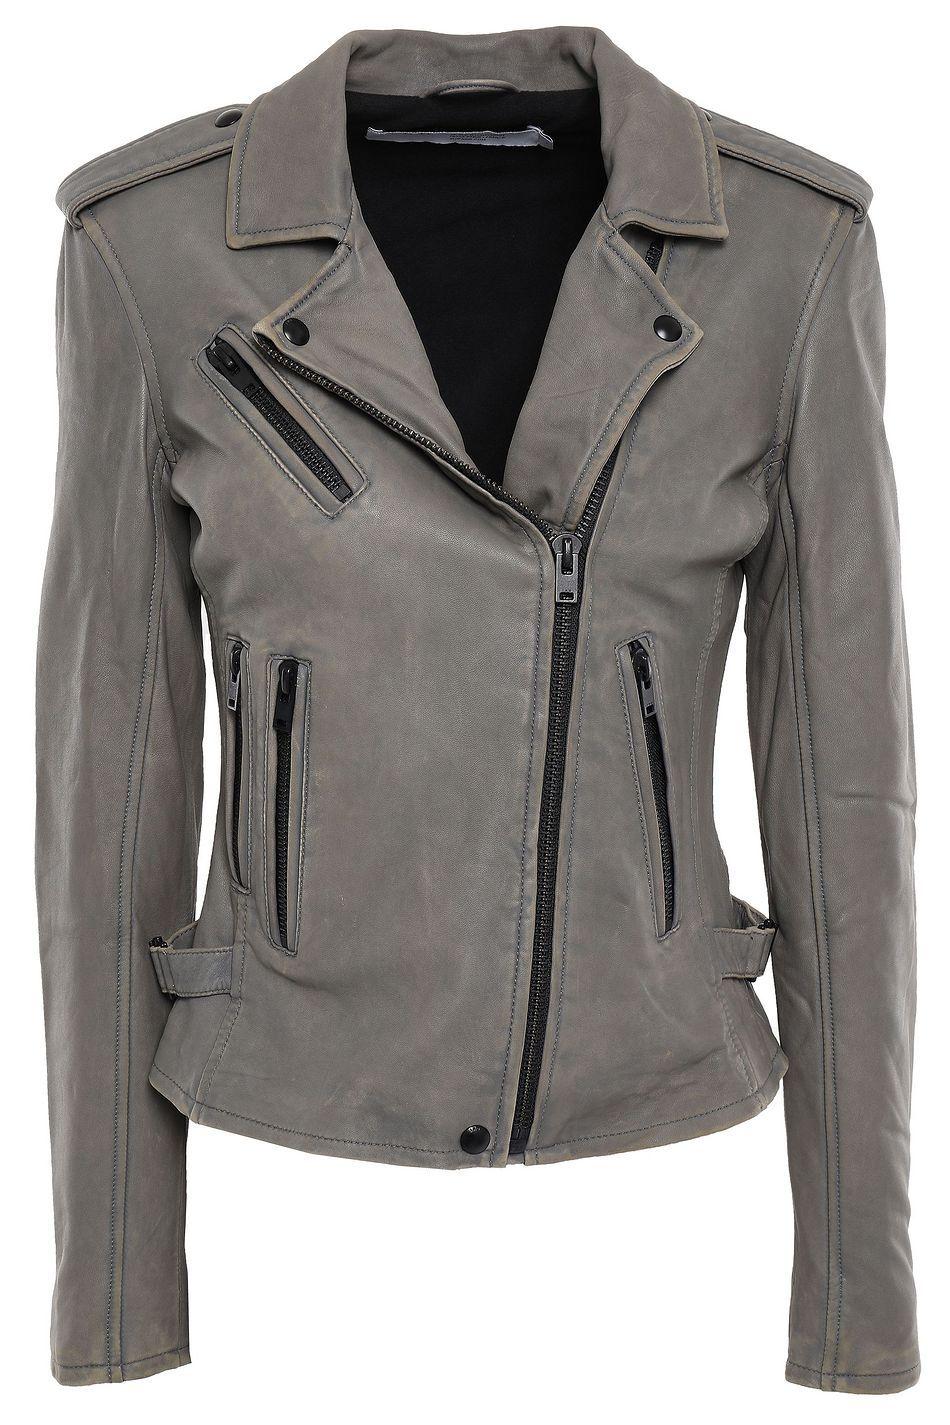 Shop onsale IRO Newhan washedleather biker jacket